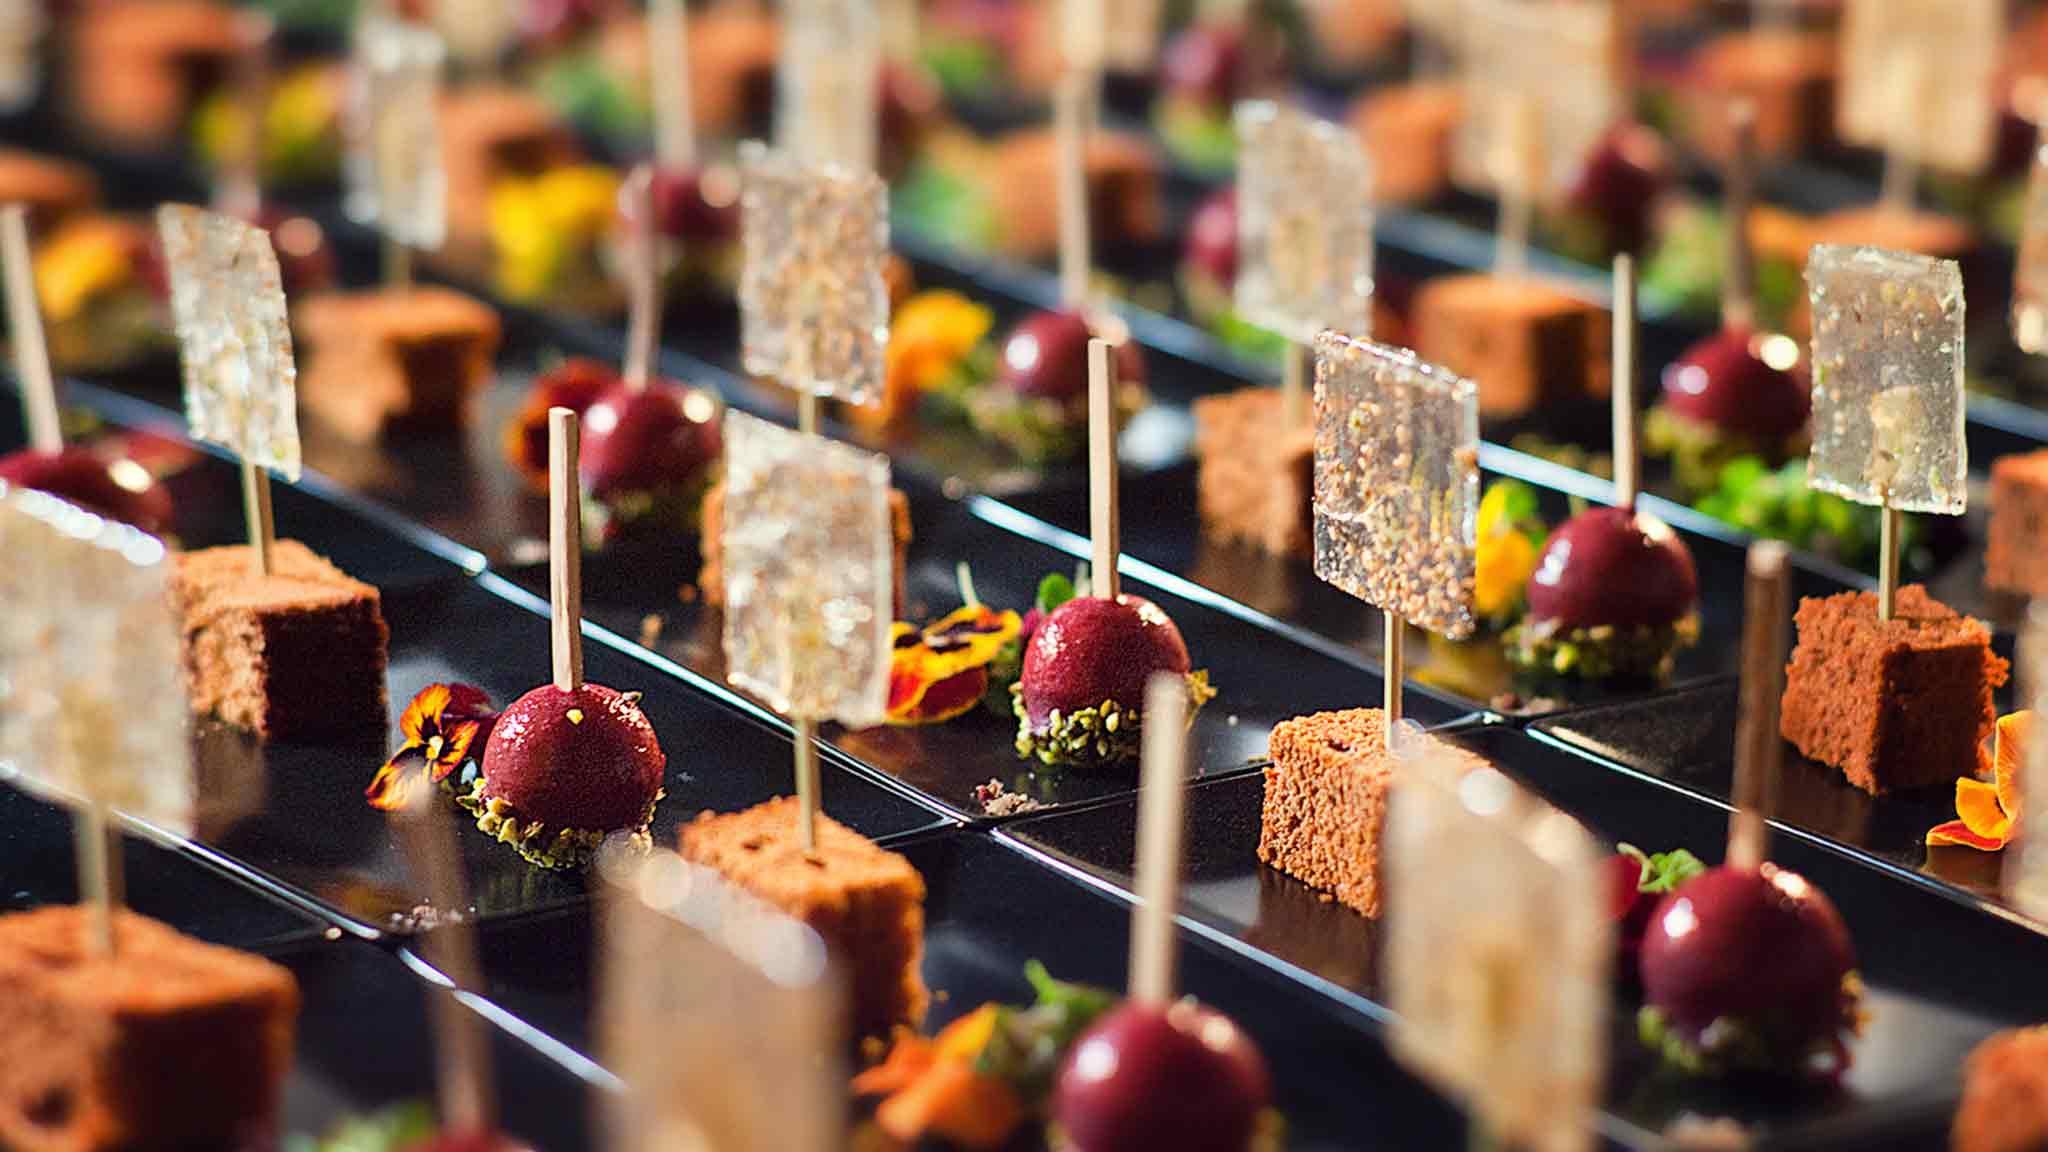 photographe photo culinaire produits pachshot restaurant dessert traiteur cuisine reportage mariage dinner gentle studio Lorraine 54